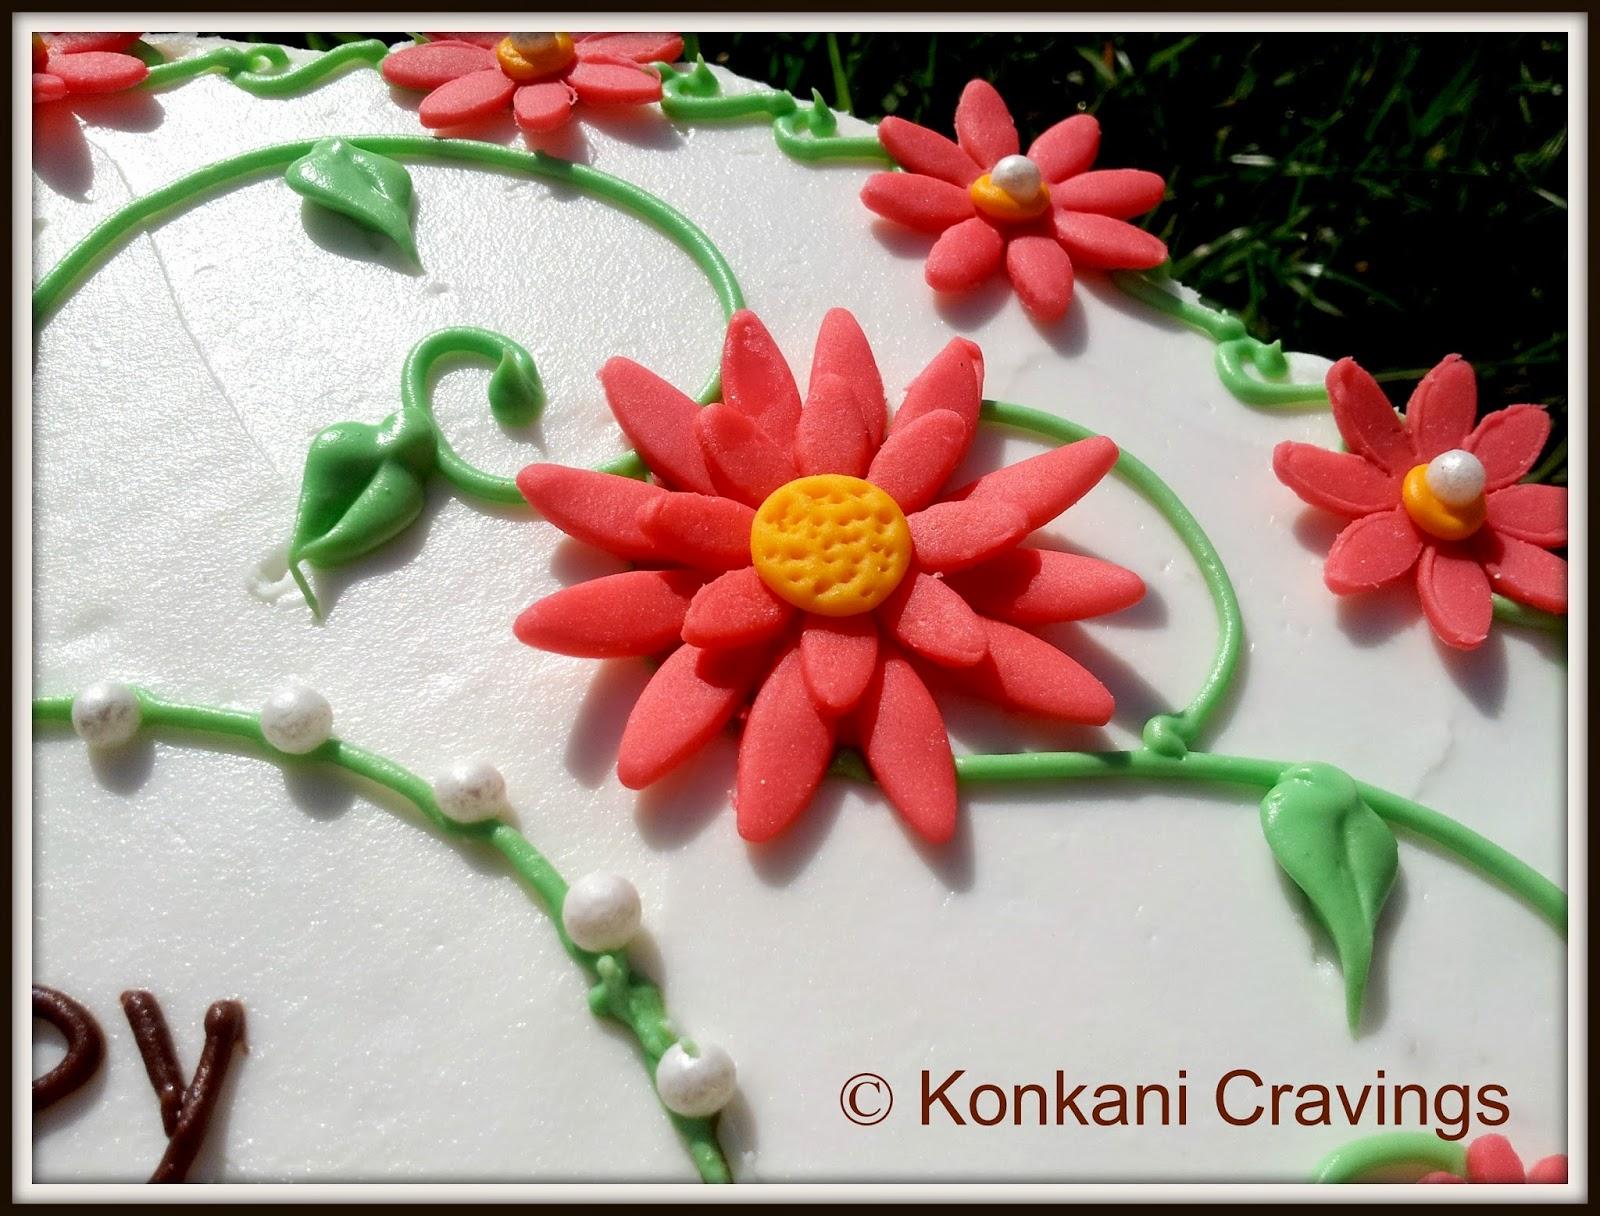 KONKANI CRAVINGS: Birthday Cake - With Fondant Flowers